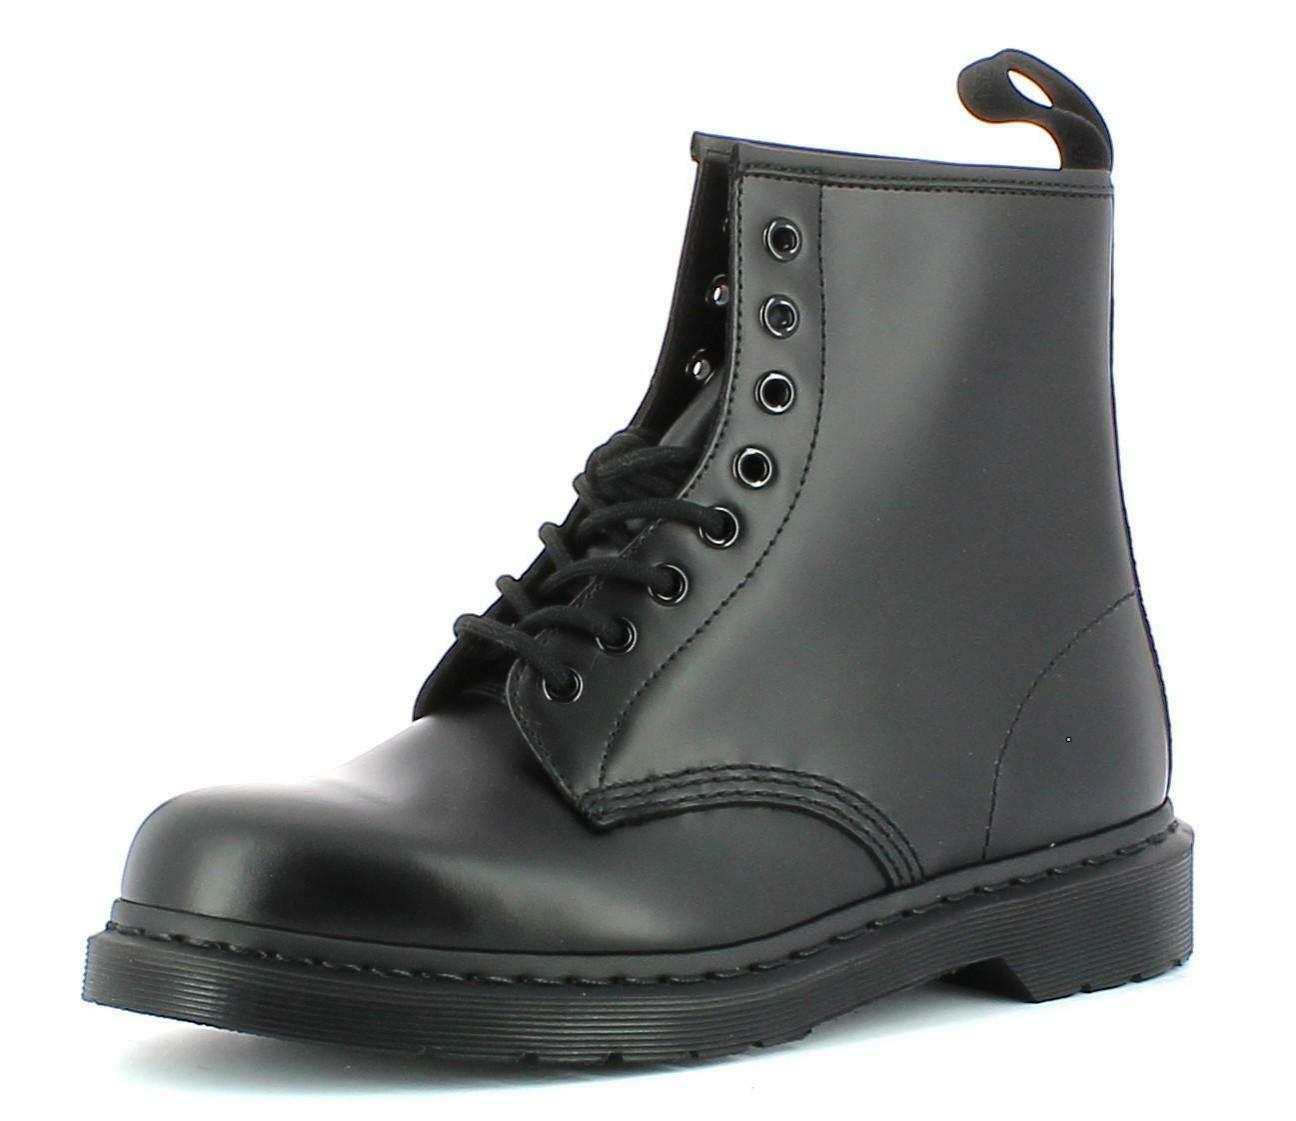 dr. martens dr. martens scarponcini neri uomo pelle